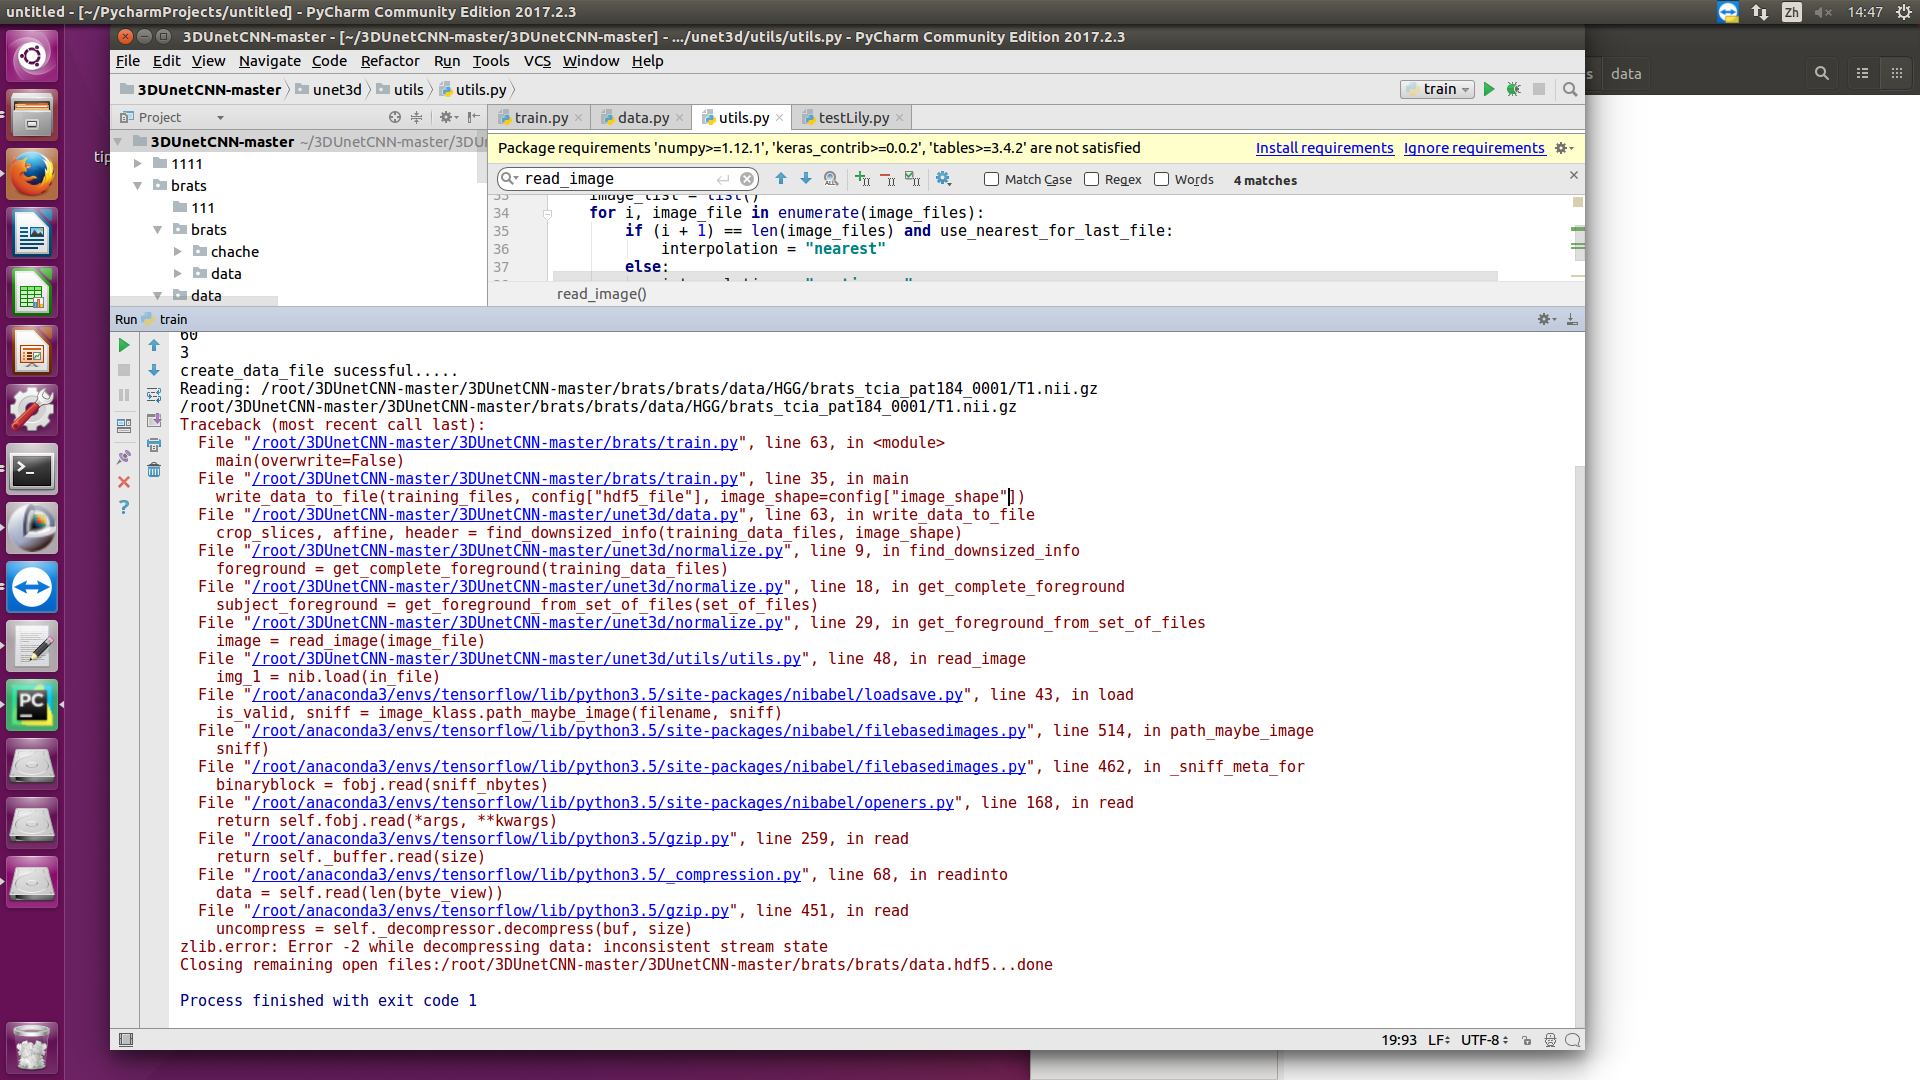 zlib error: Error -2 while decompressing data: inconsistent